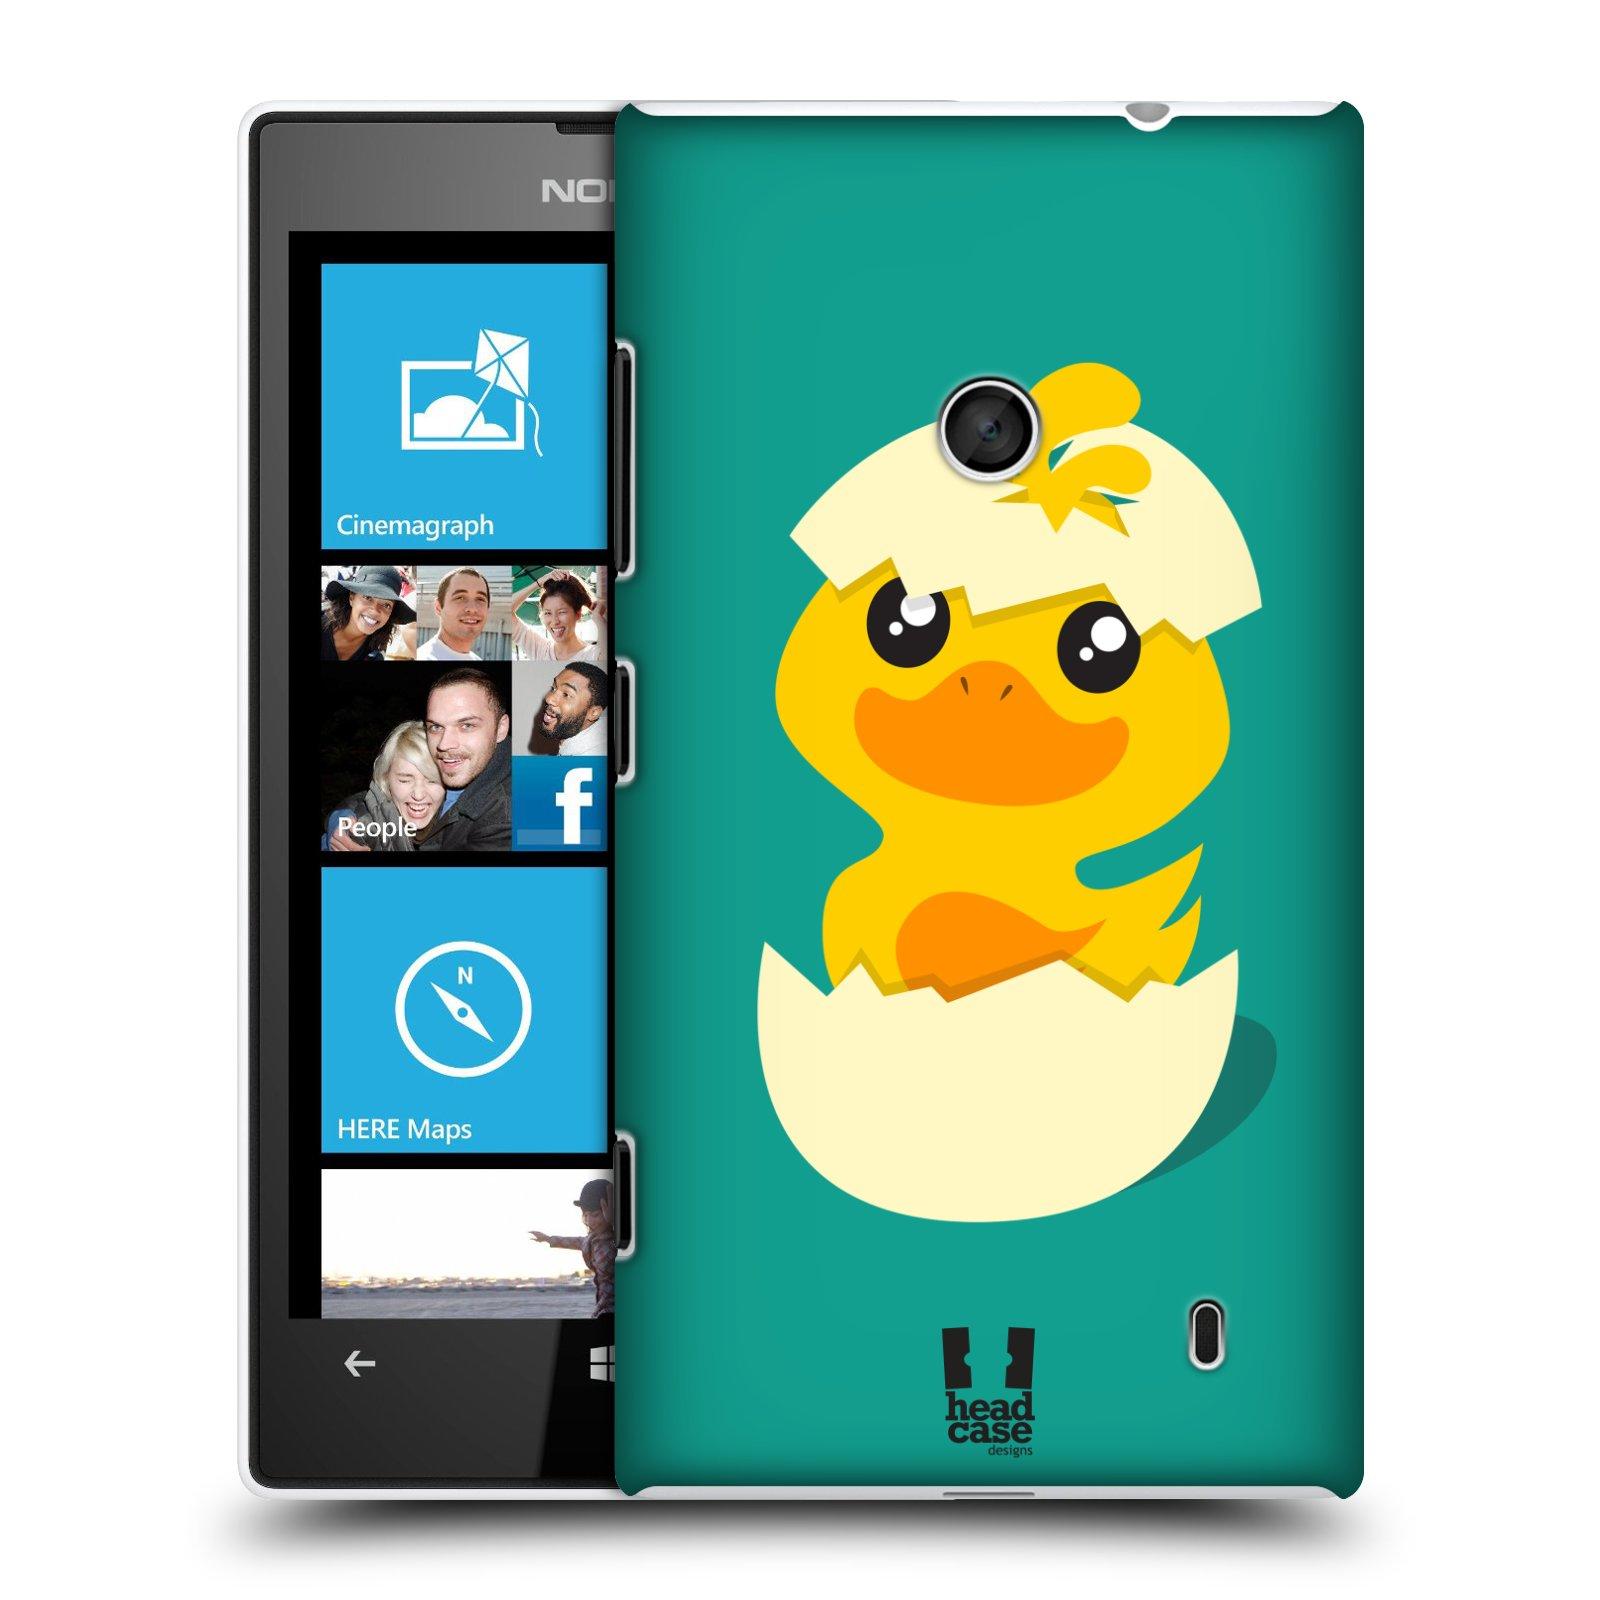 Plastové pouzdro na mobil Nokia Lumia 520 HEAD CASE KACHNIČKA Z VAJÍČKA (Kryt či obal na mobilní telefon Nokia Lumia 520 )